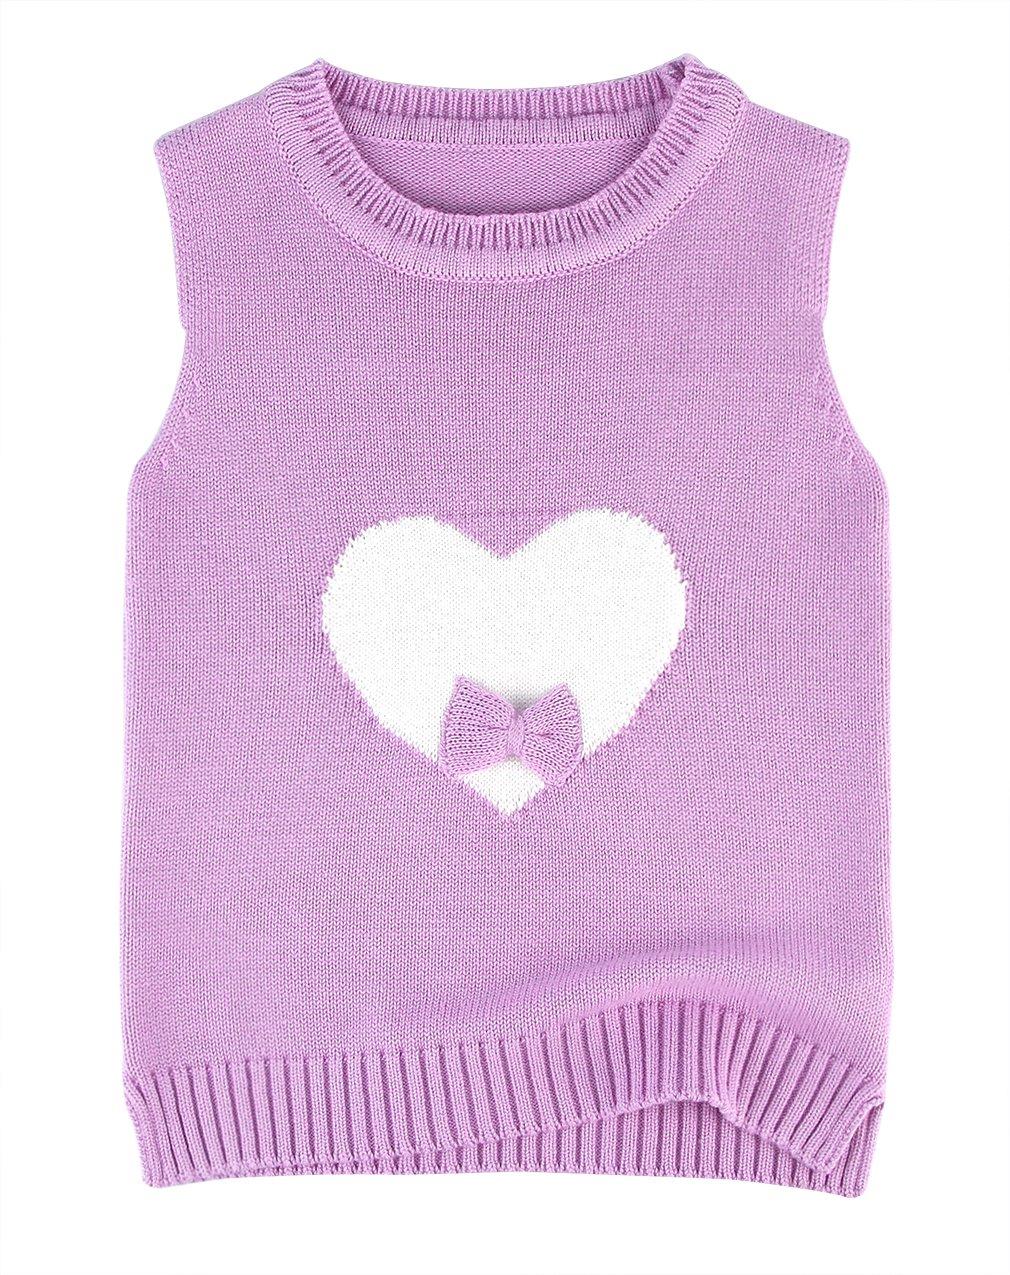 La Vogue Baby Girls Cotton Warm Vests Infant Waistcoat Cable Knit Sweater Pink 100